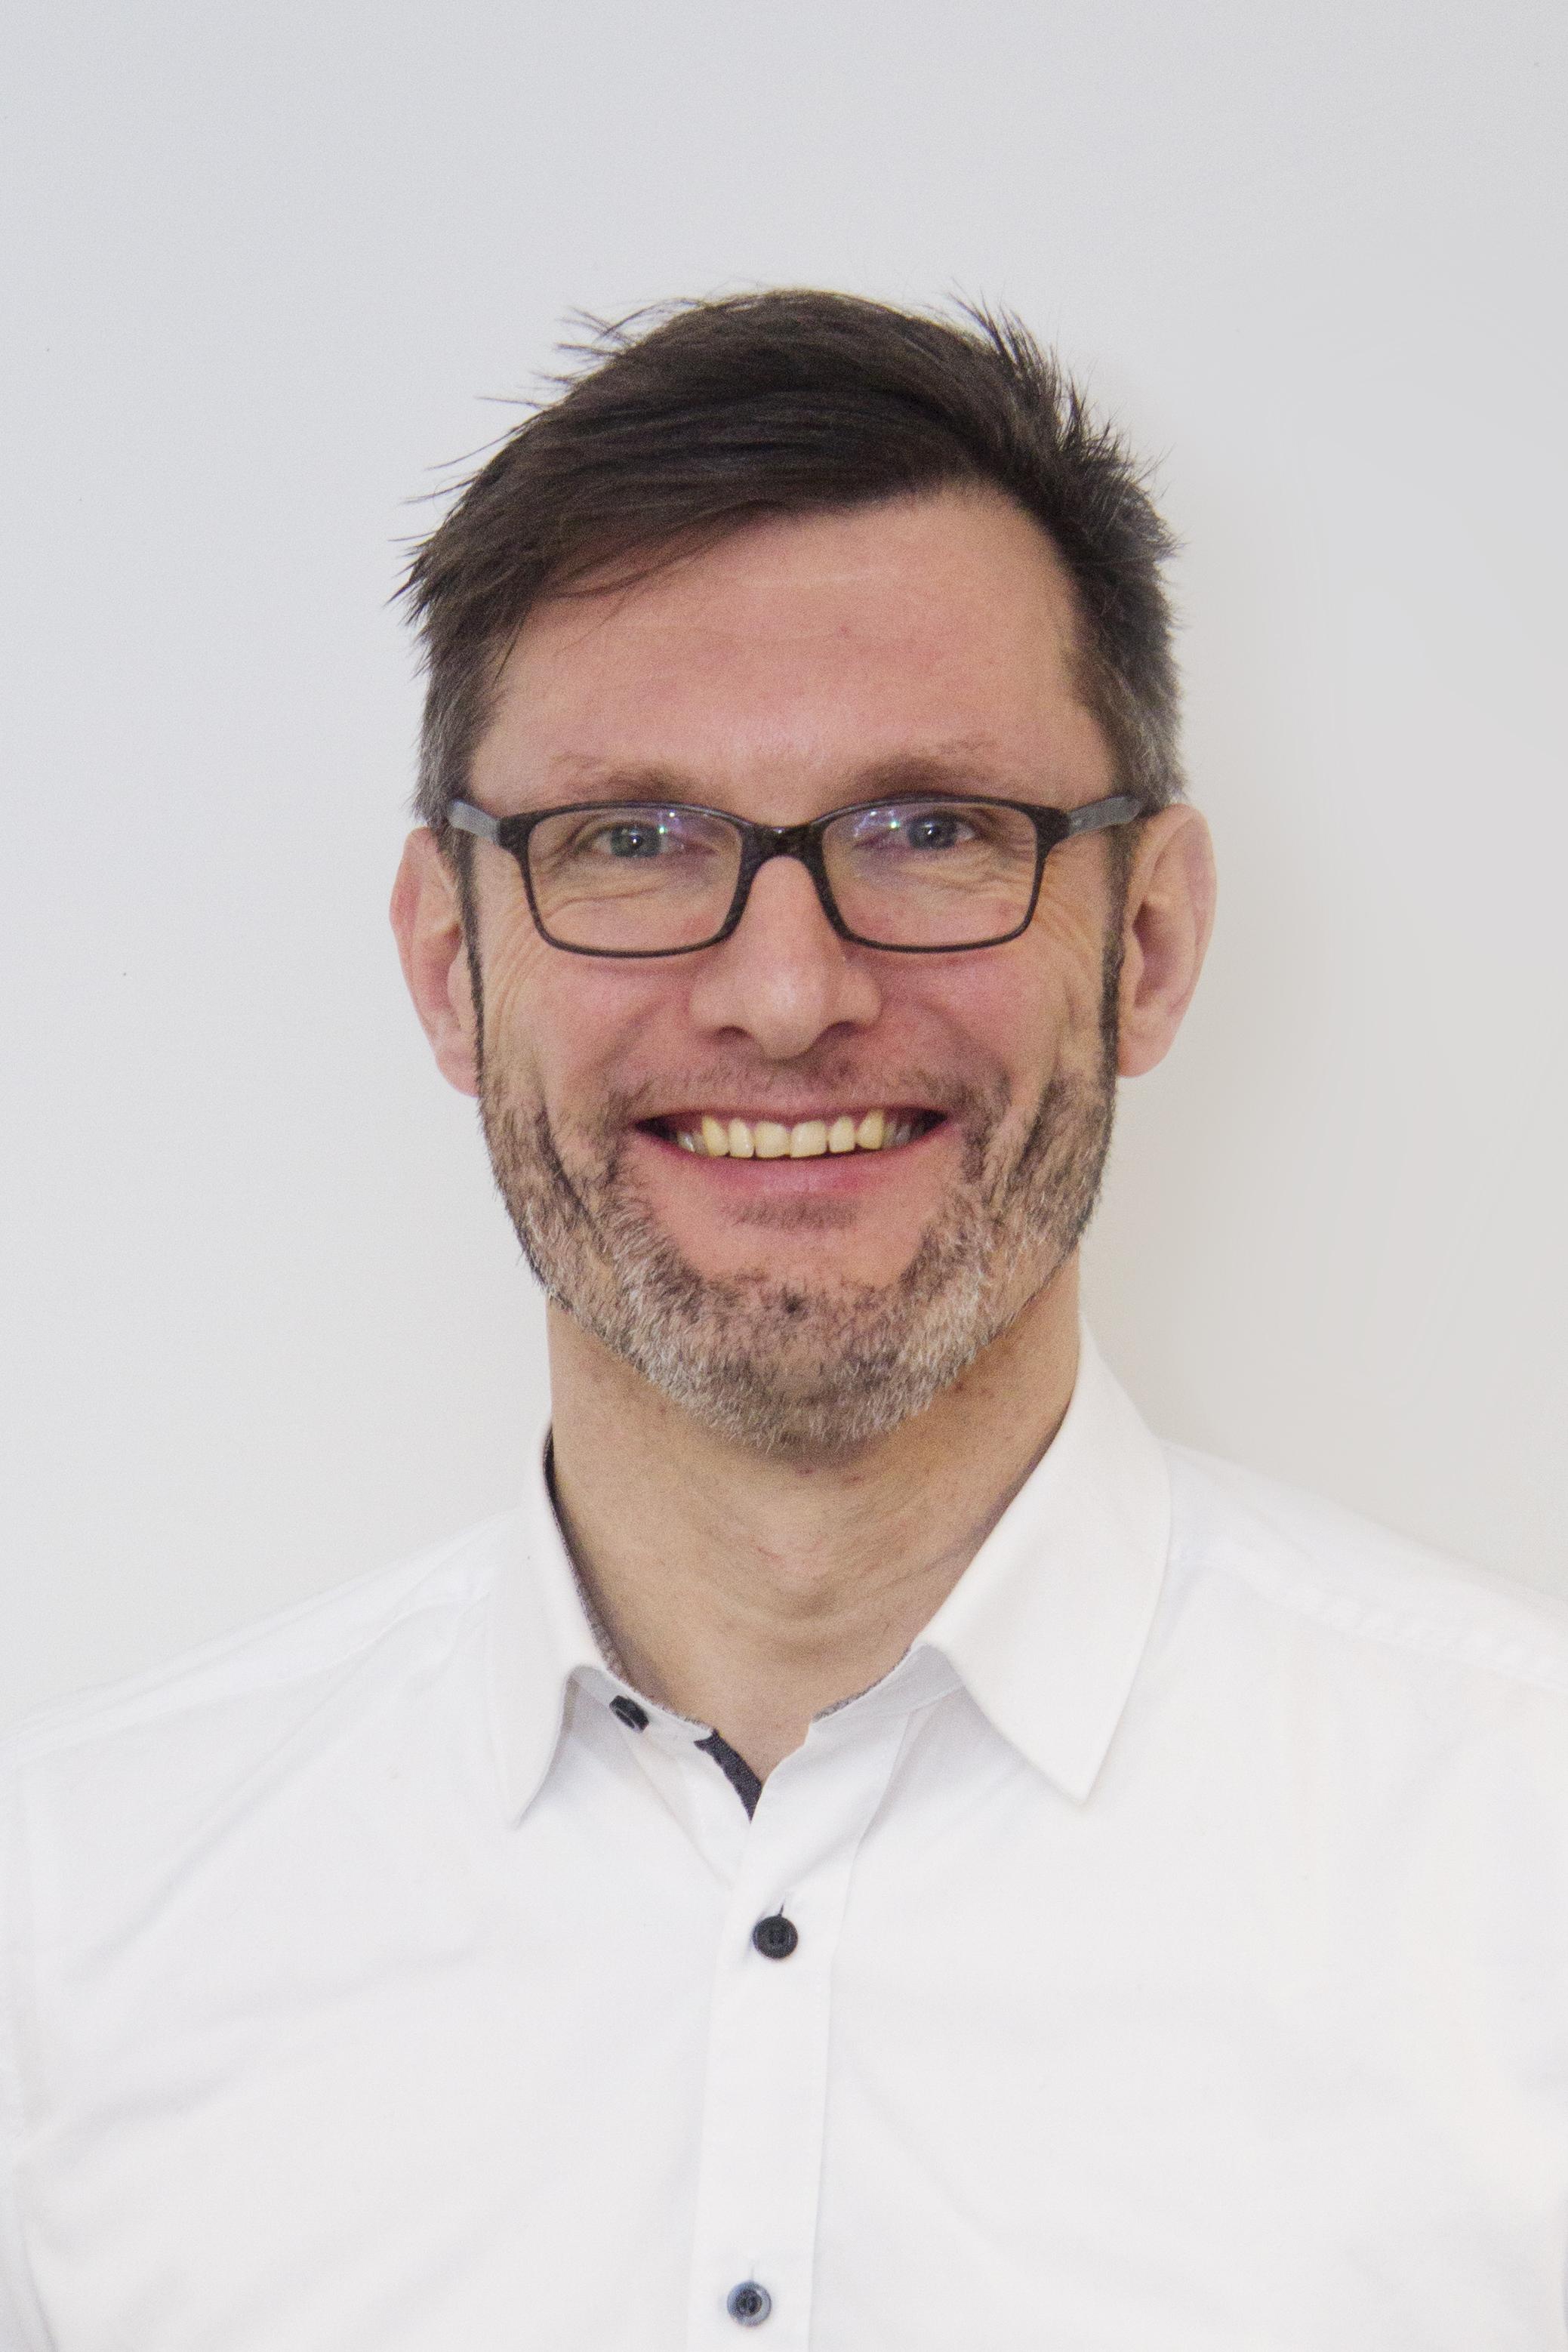 Stefan Vaessen